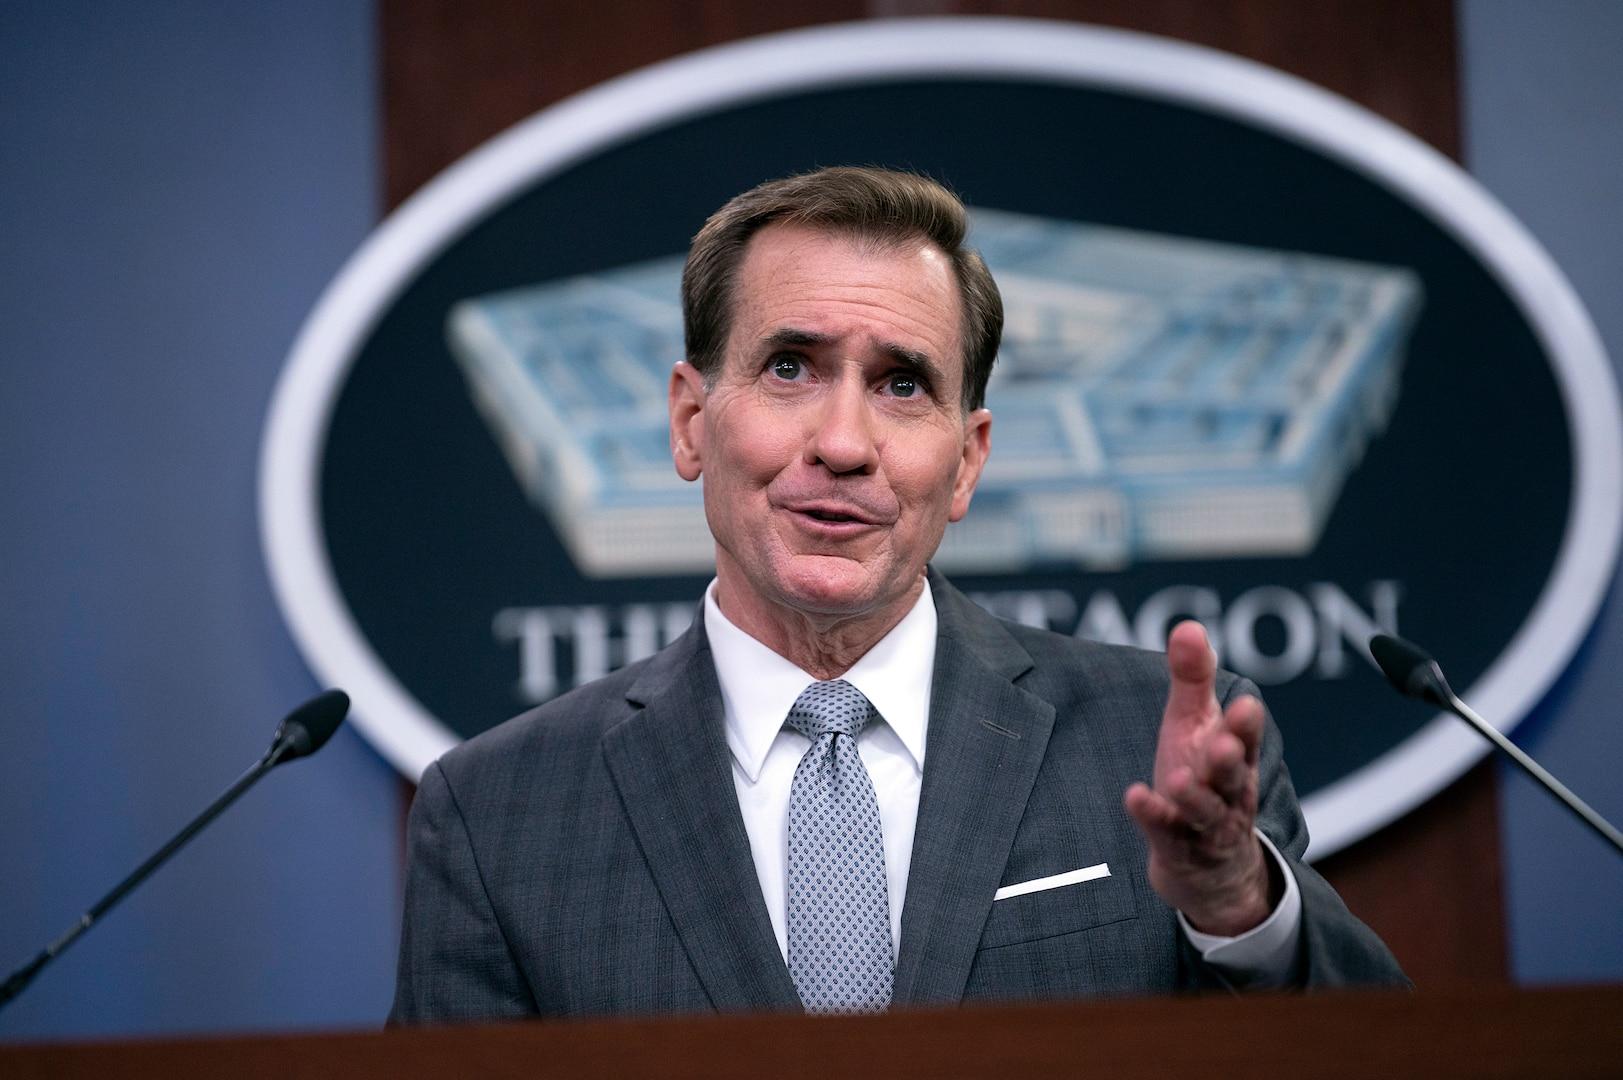 A man briefs the media inside the Pentagon.